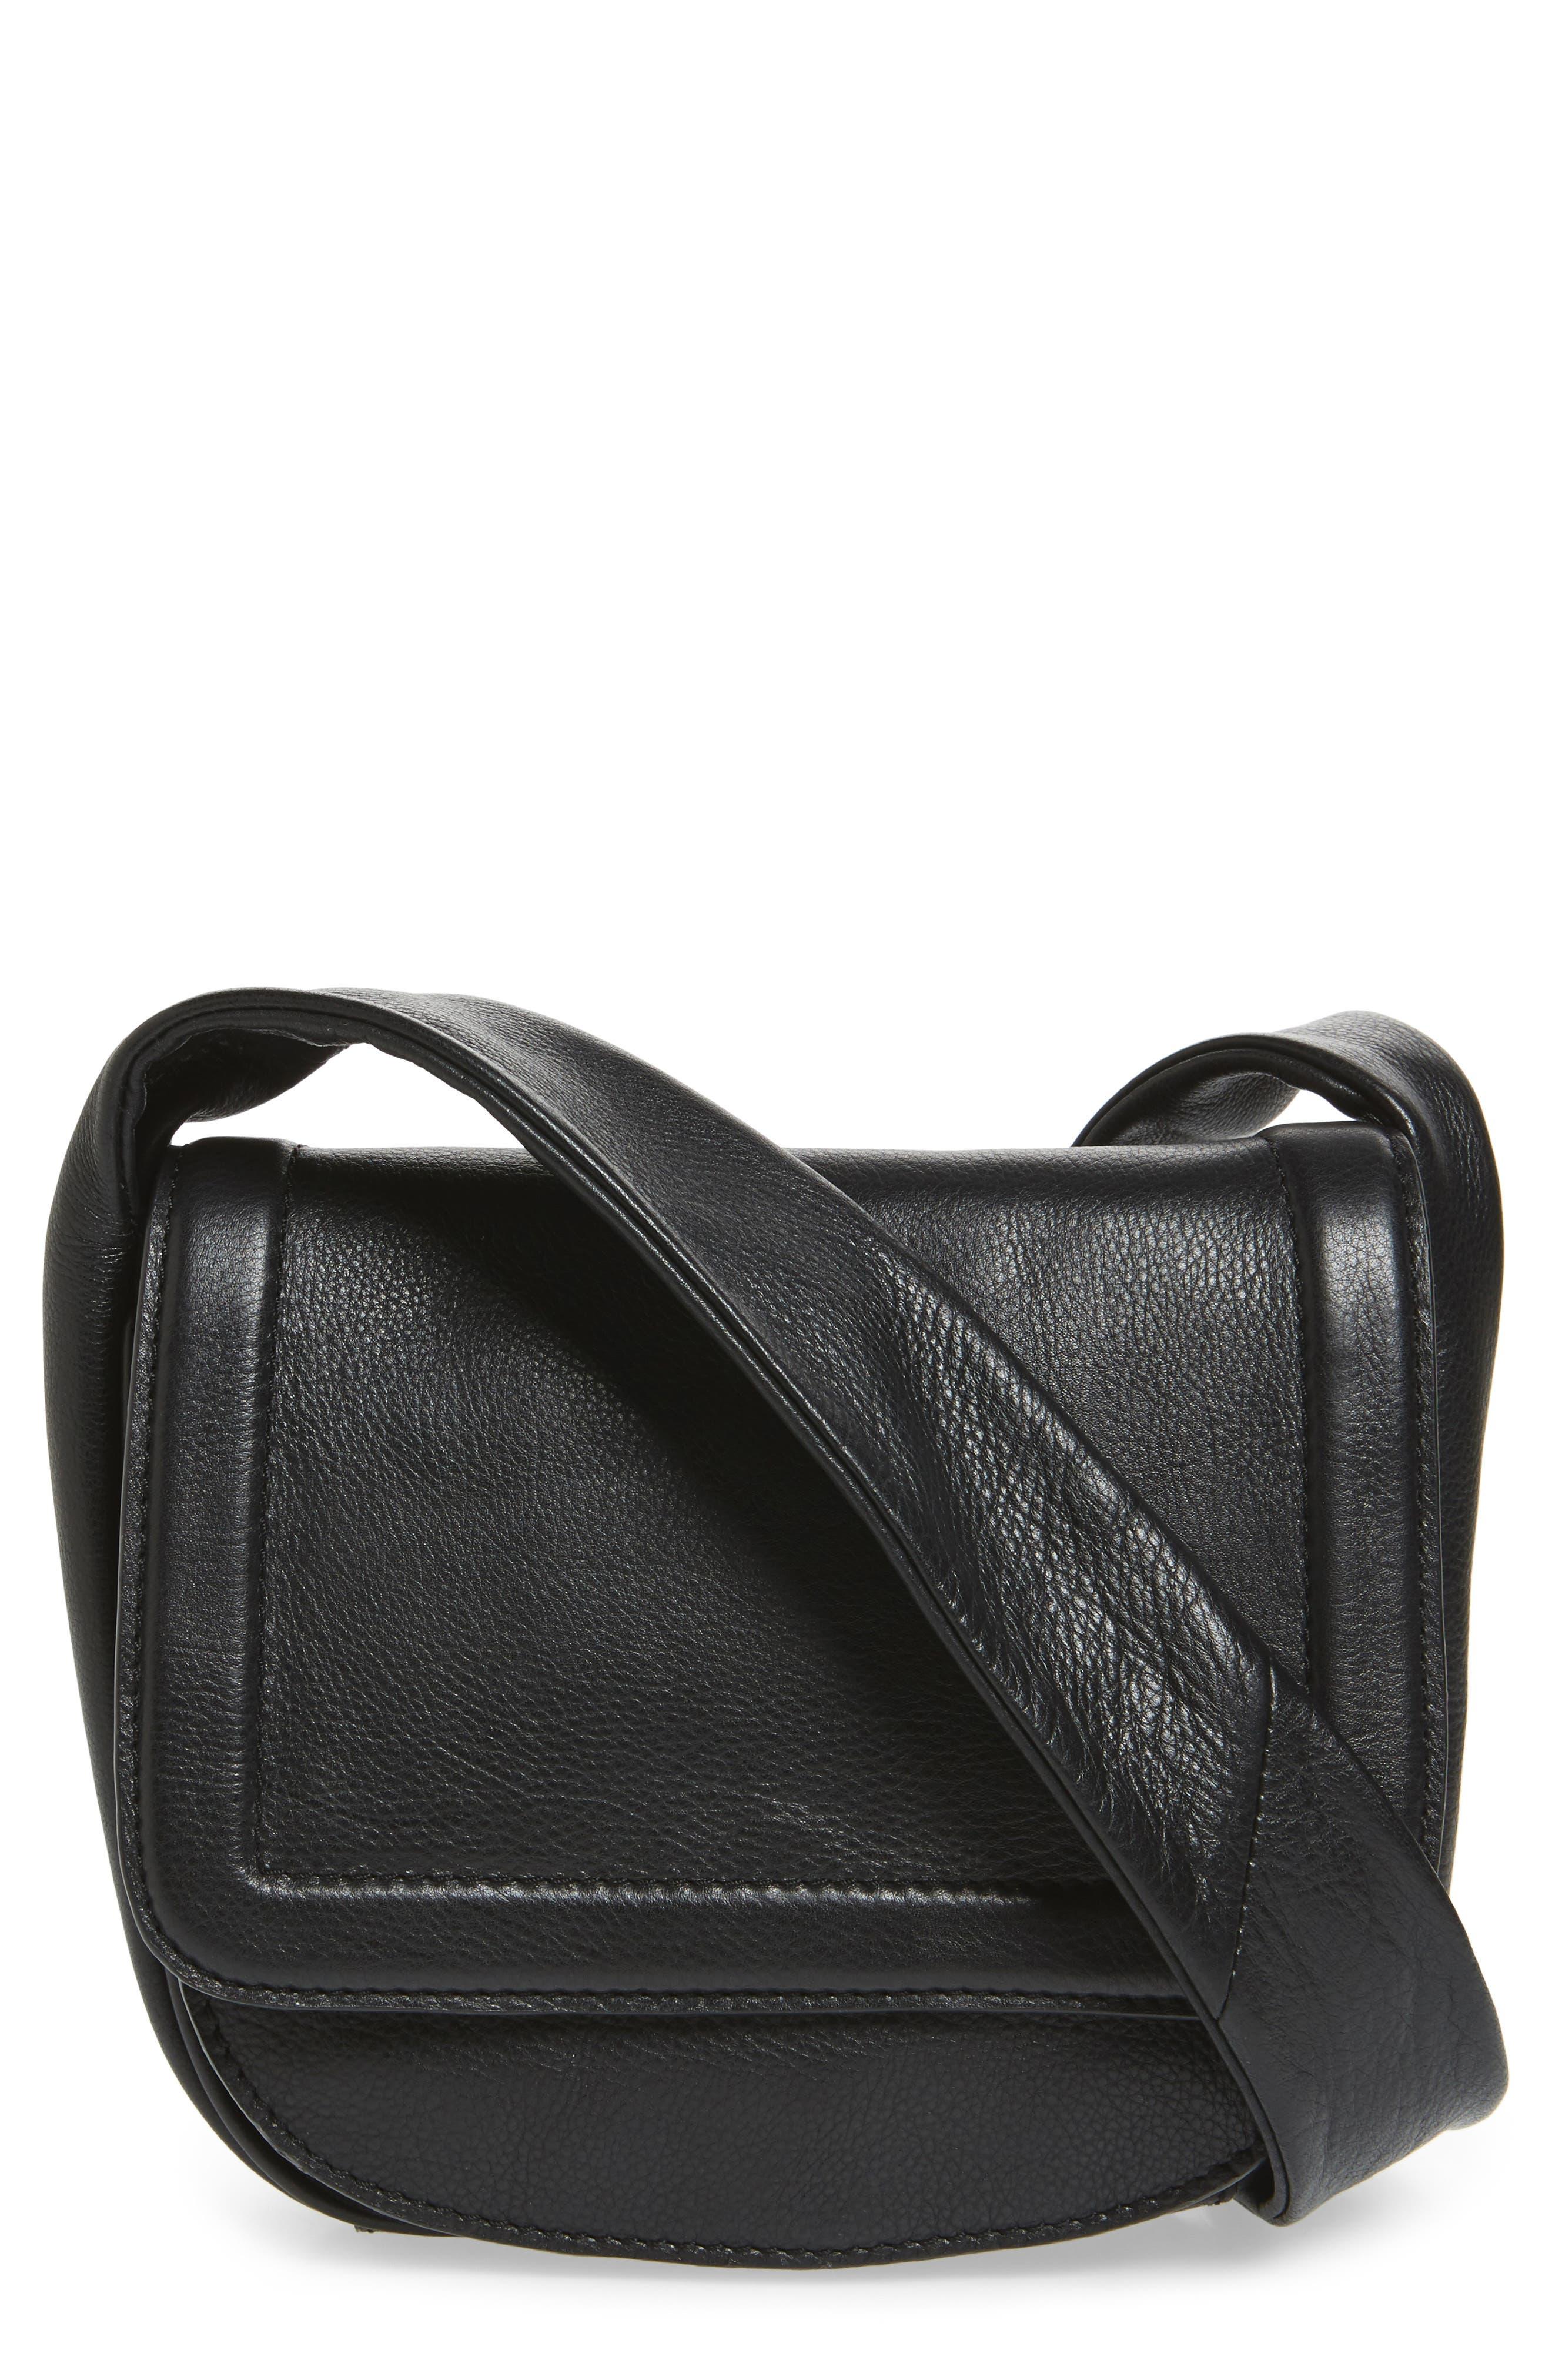 Jasmine Leather Saddle Bag,                             Main thumbnail 1, color,                             001